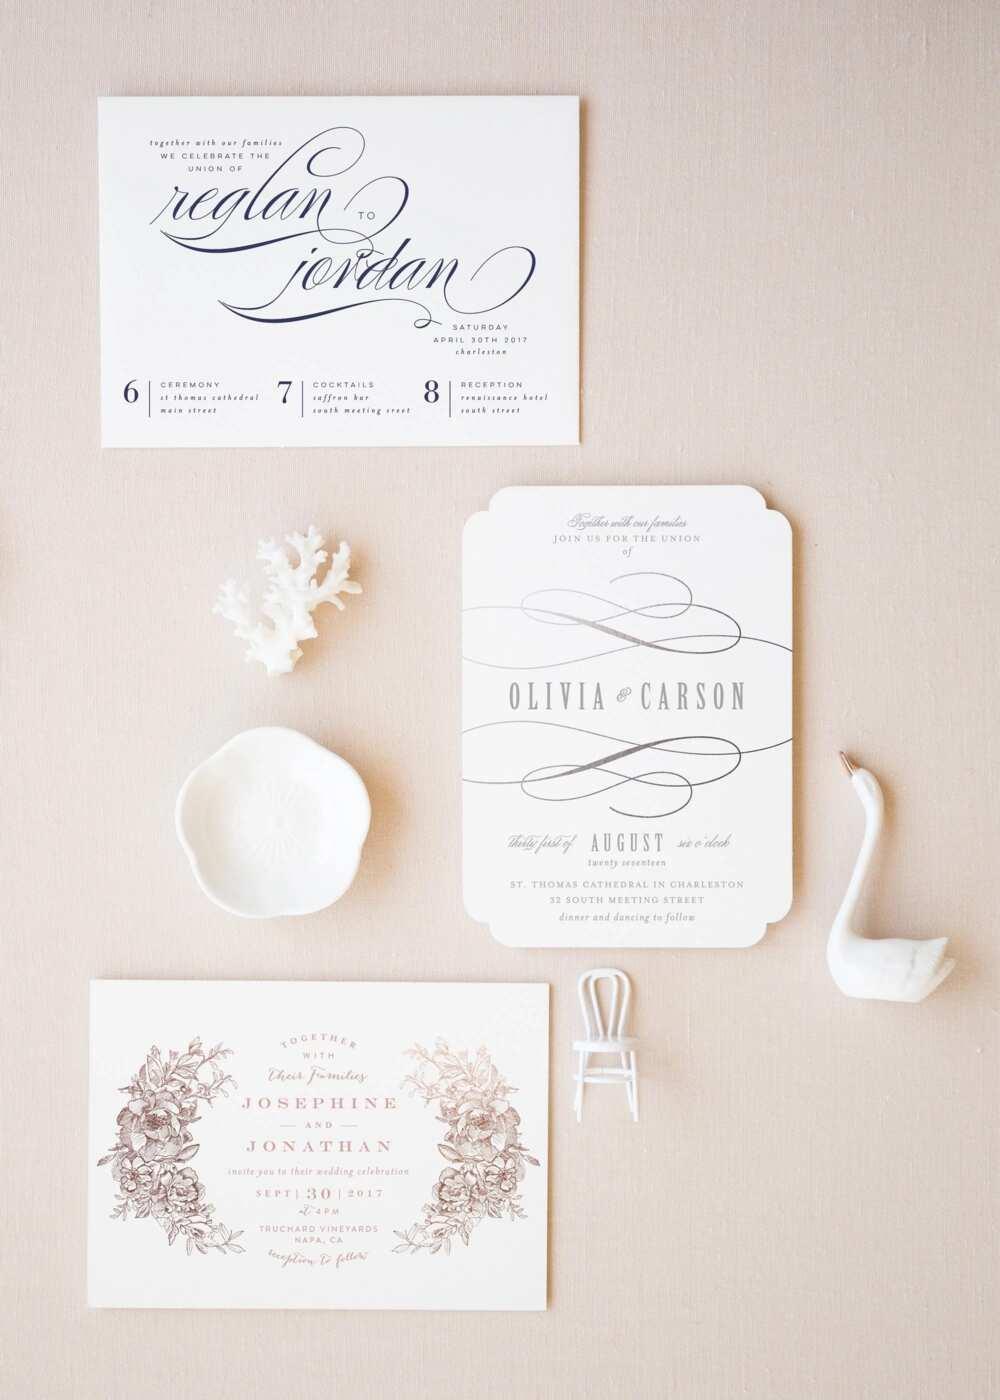 Nigerian wedding invitation cards - DIY ideas ▷ Legit.ng